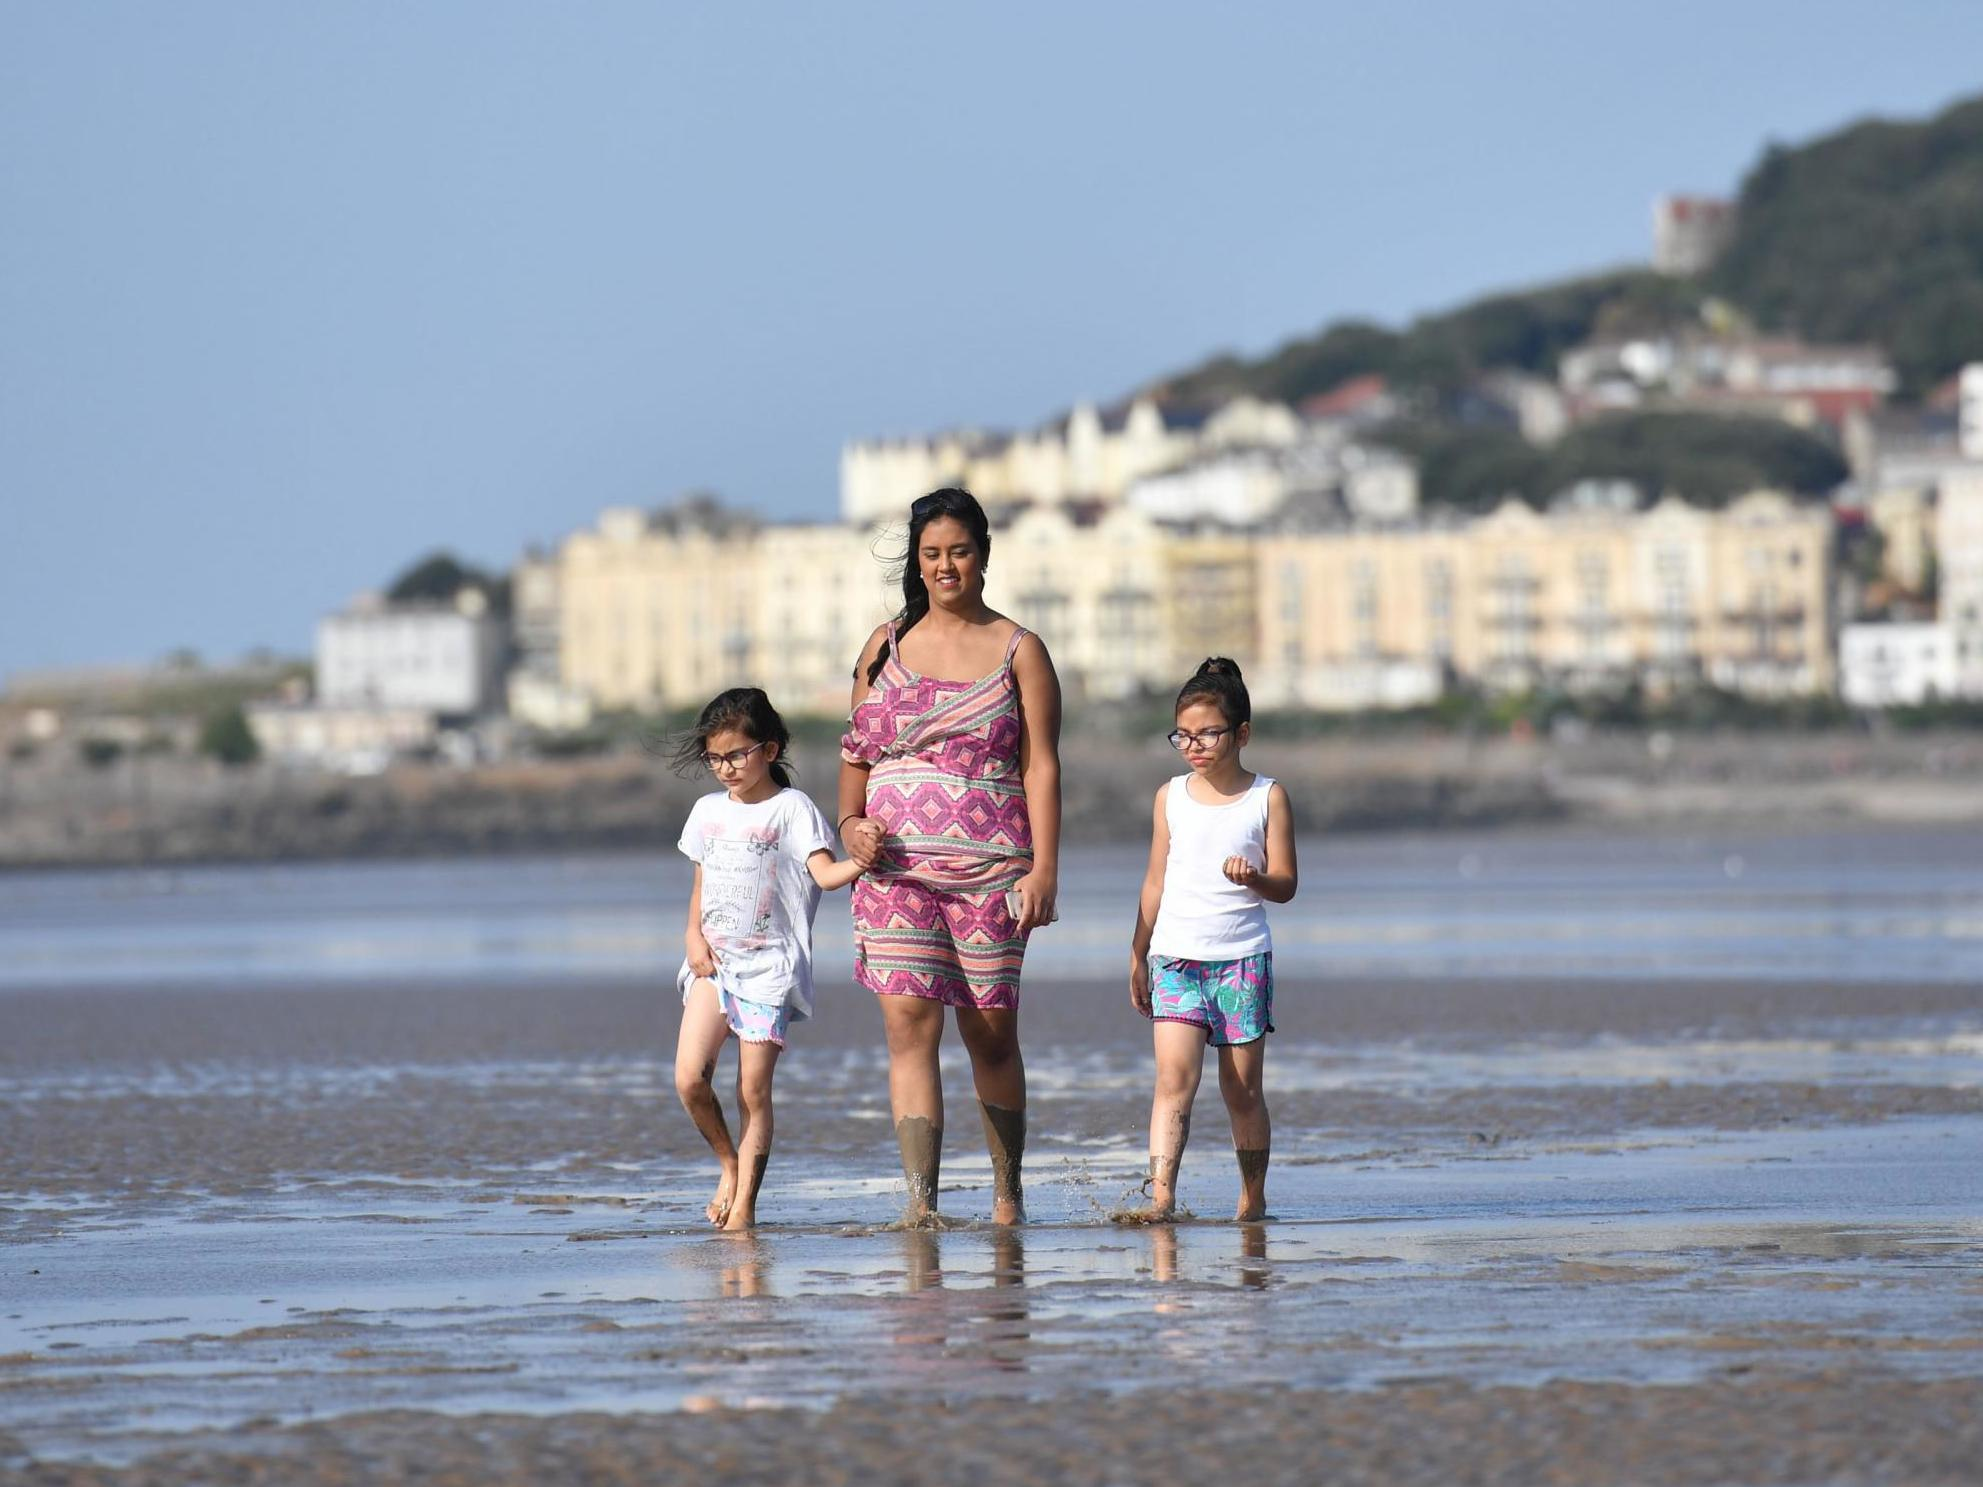 UK weather: Britain basks in last of summer sun as temperatures top 27C